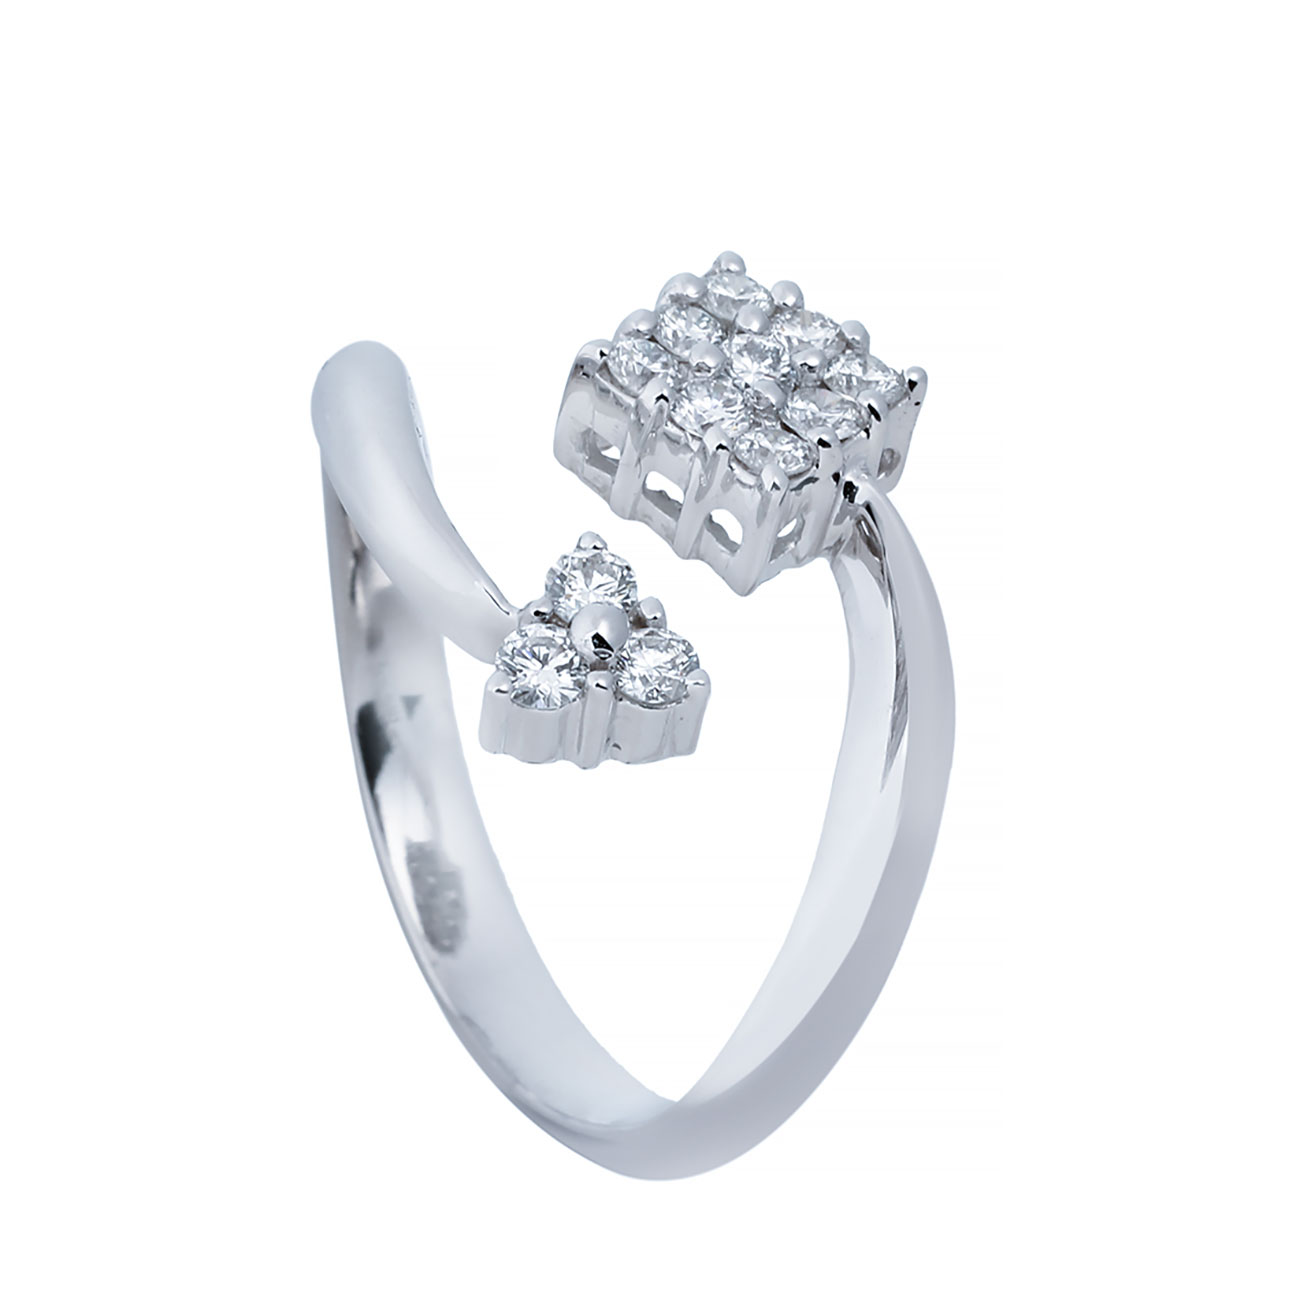 انگشتری برليان 66894 C گوهربين goharbin